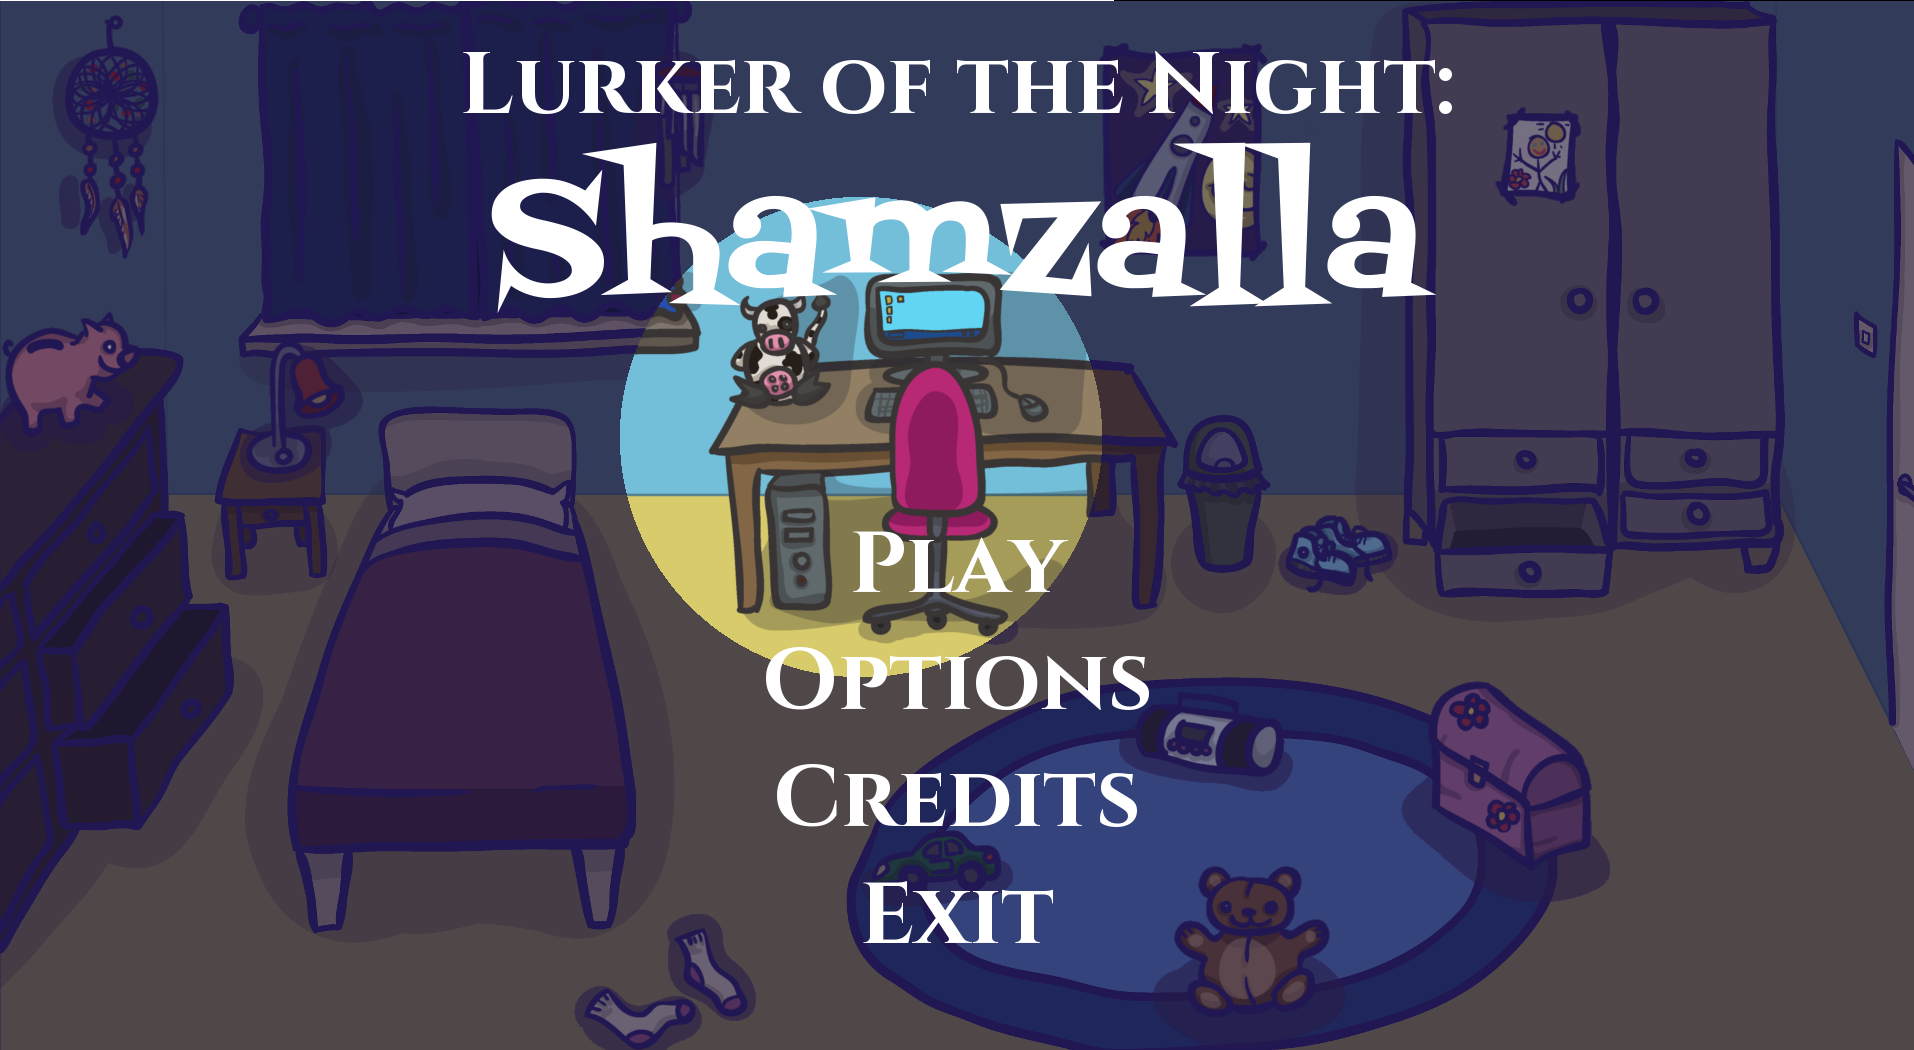 Lurker of the Night: Shamzalla